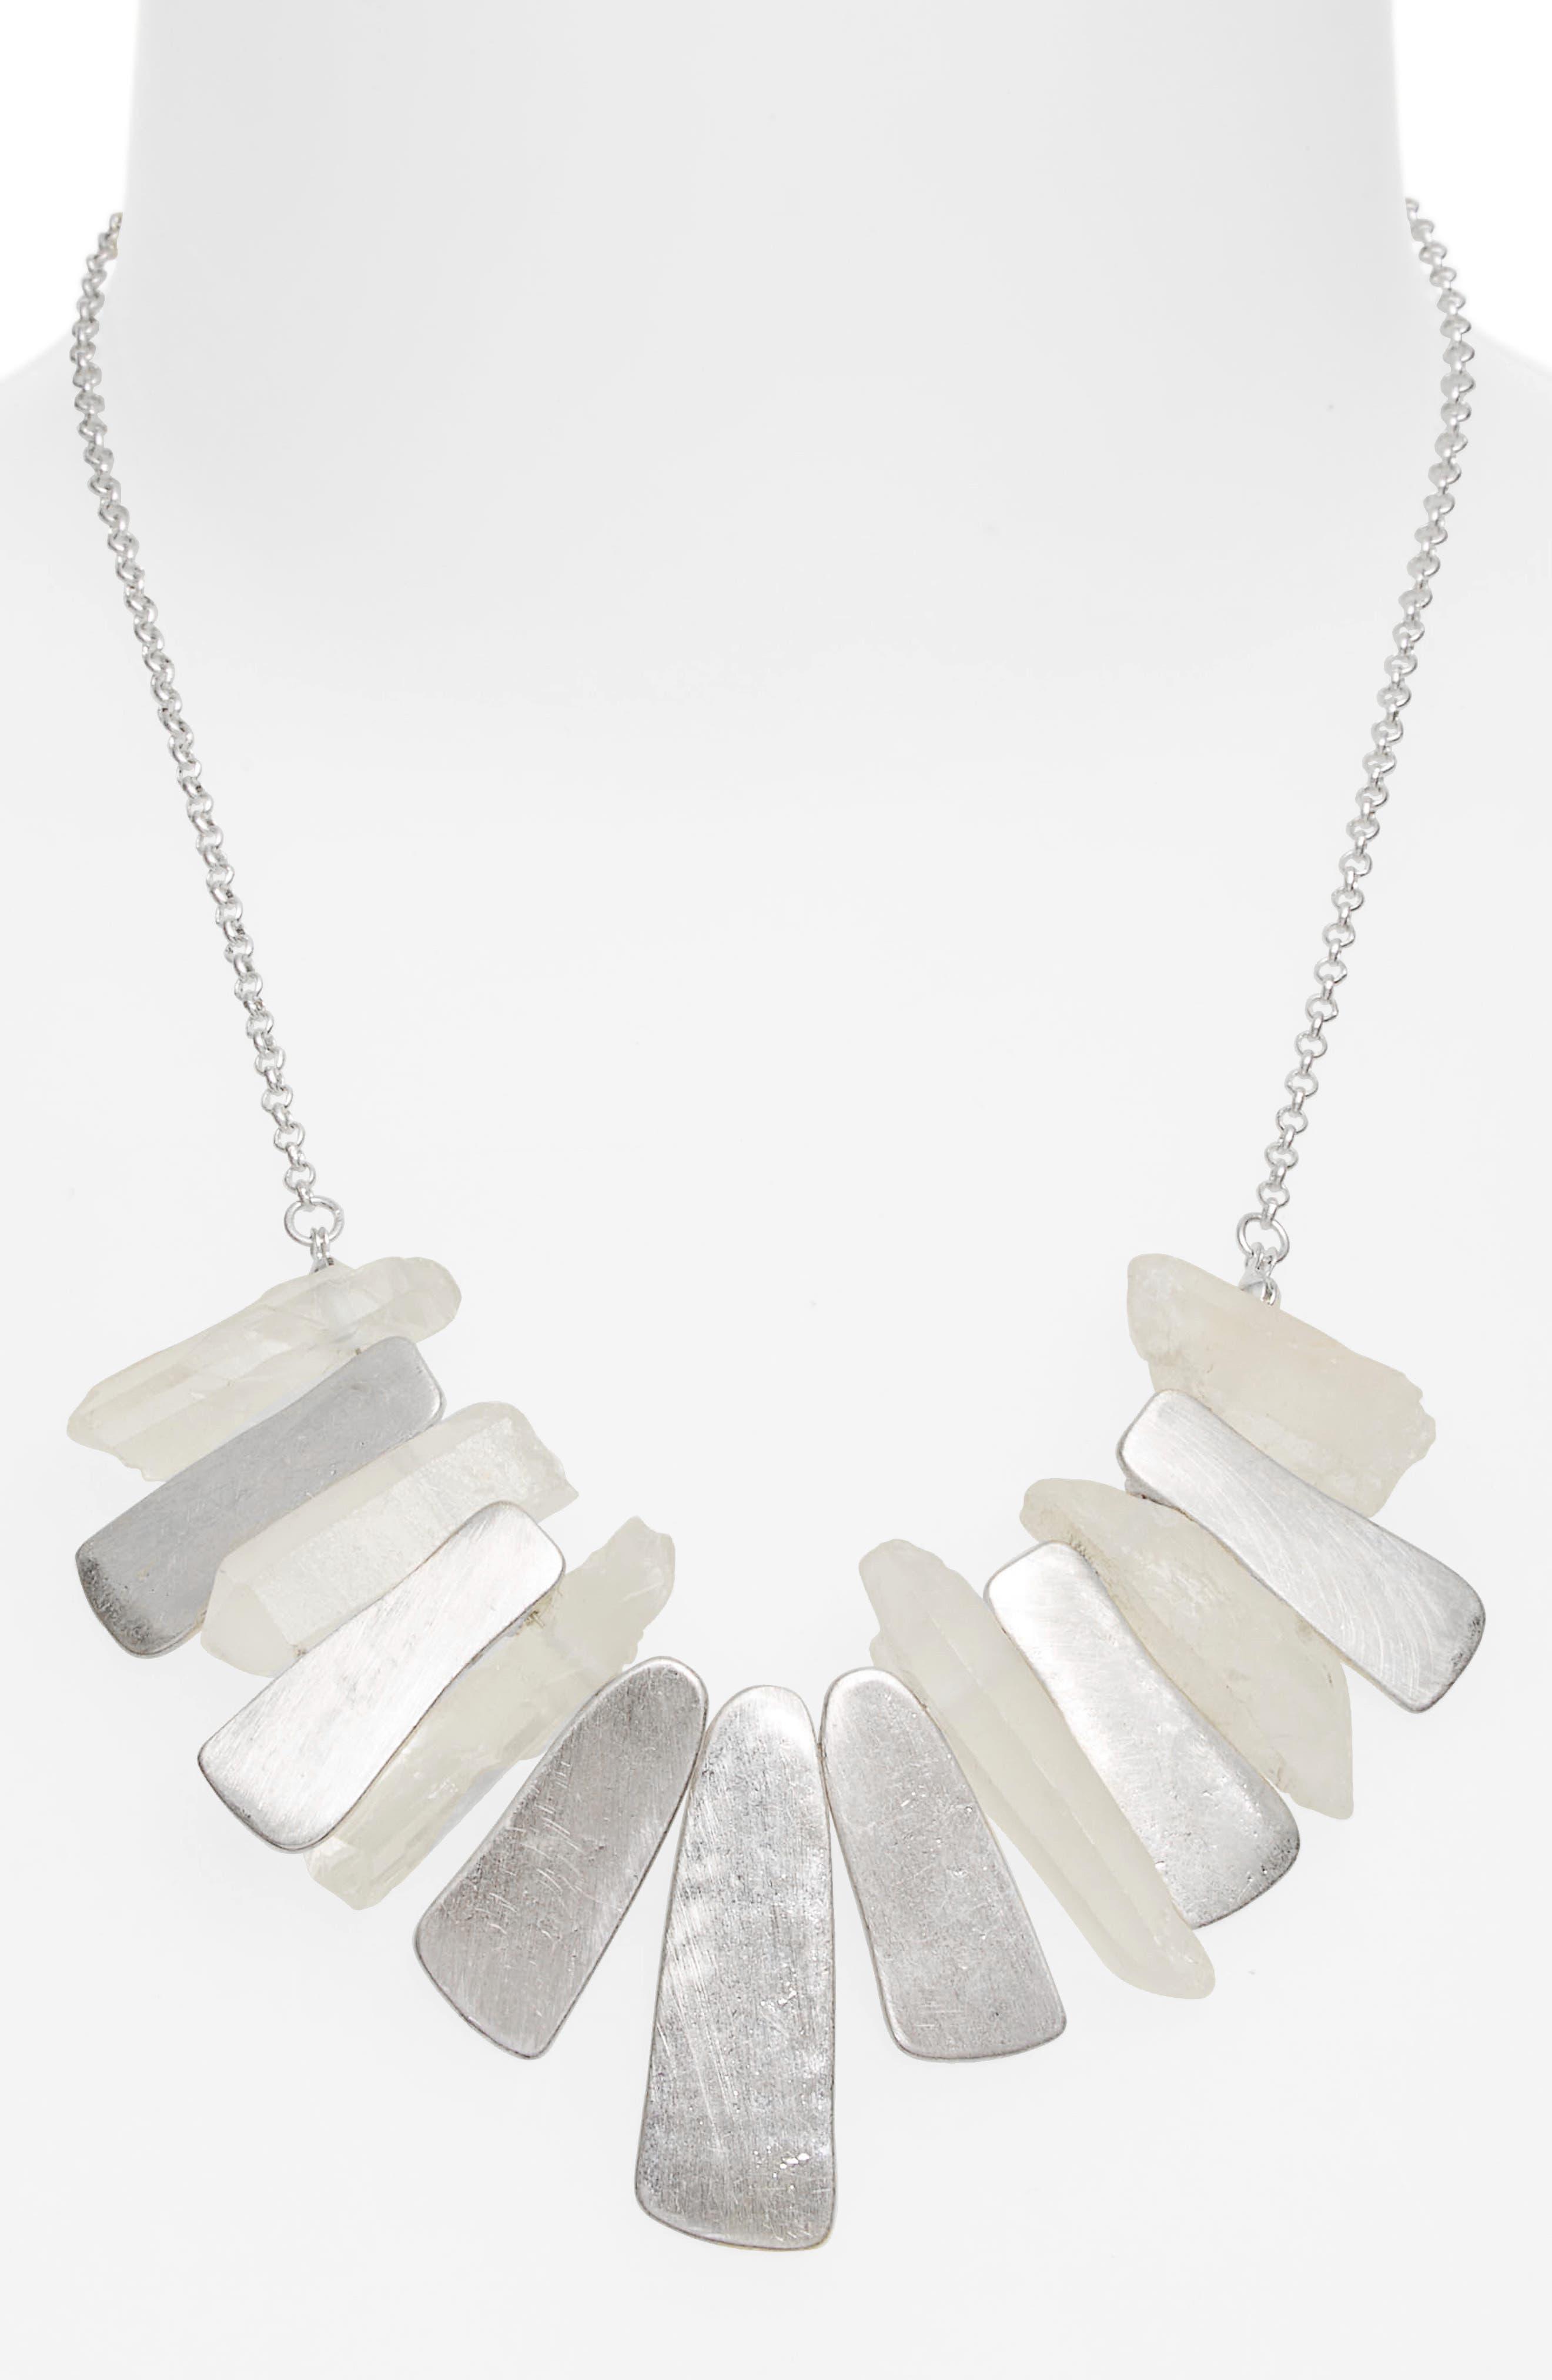 Pyrite Stone Necklace,                             Alternate thumbnail 2, color,                             040